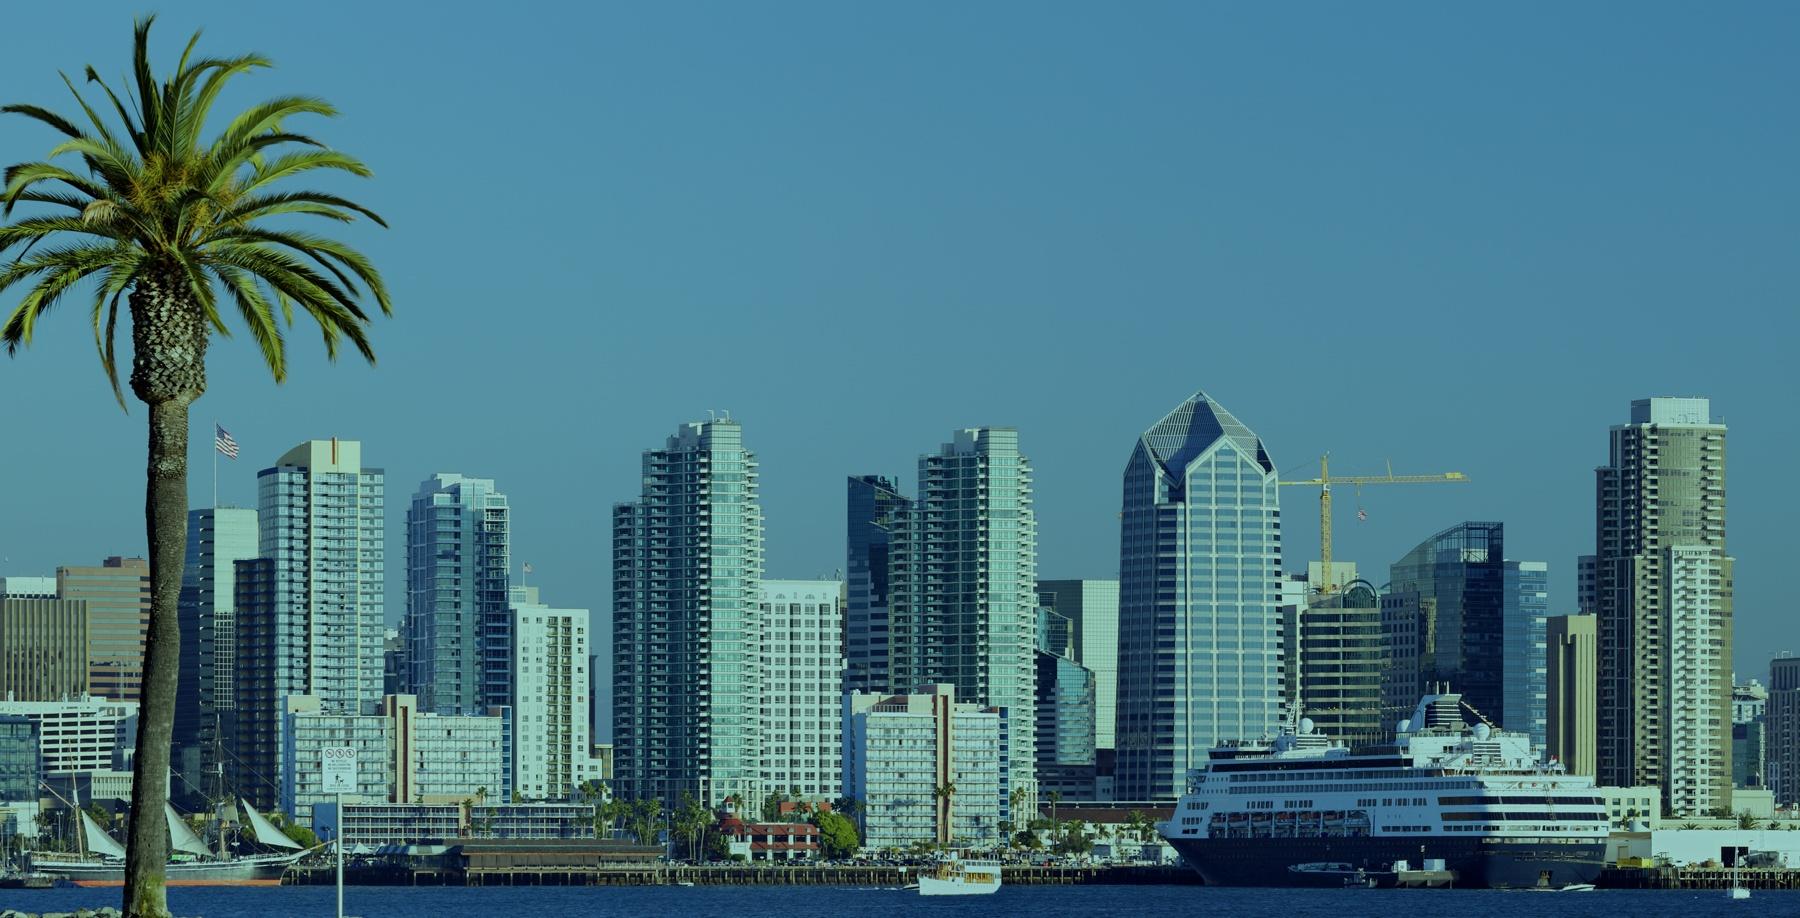 sd_skyline-photo.jpg